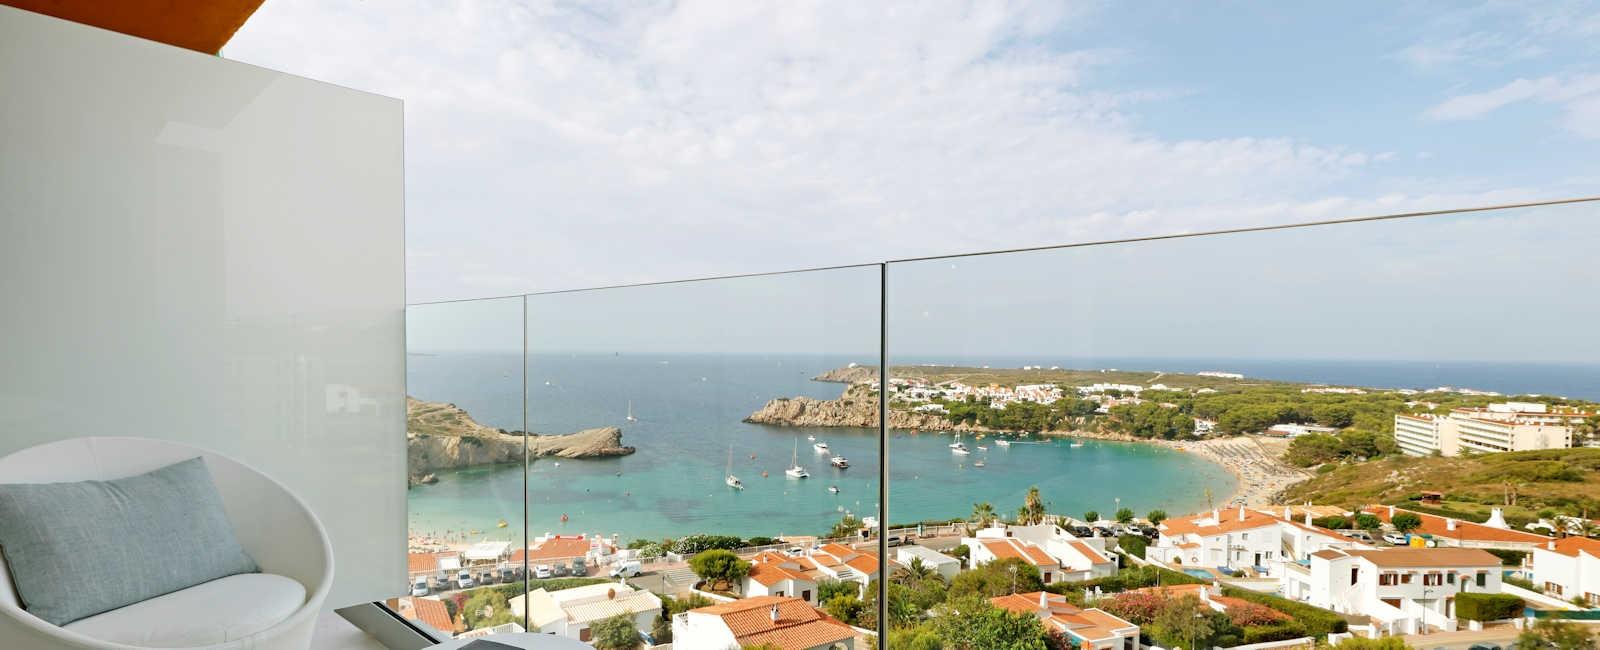 Arenal d'en Castell, main resort image